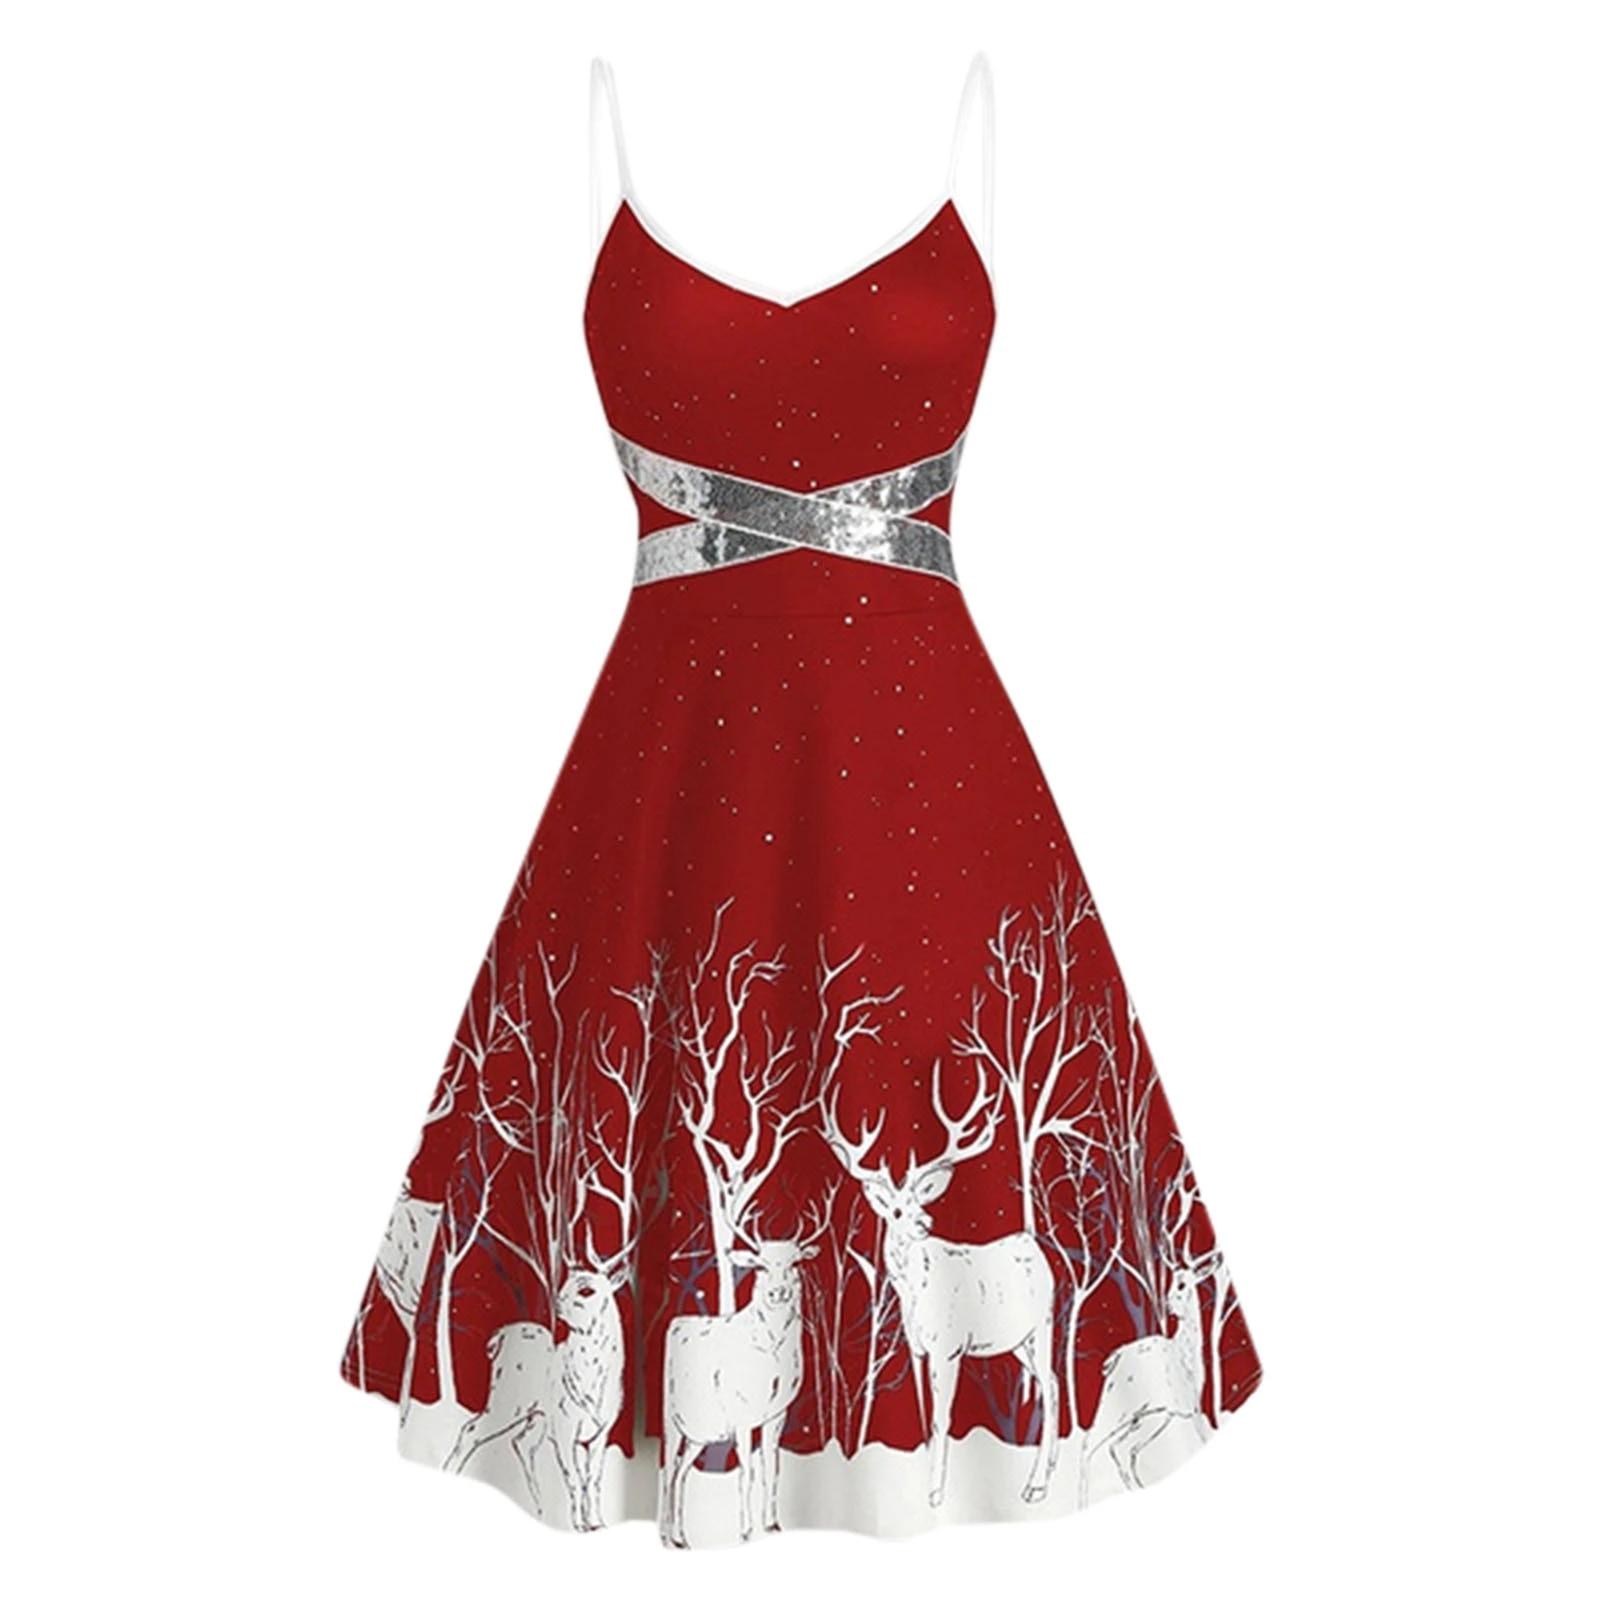 Christmas Print Dresses 2020 2020 Christmas Print Dress Sequin Patchwork Sleeveless Dress Sexy